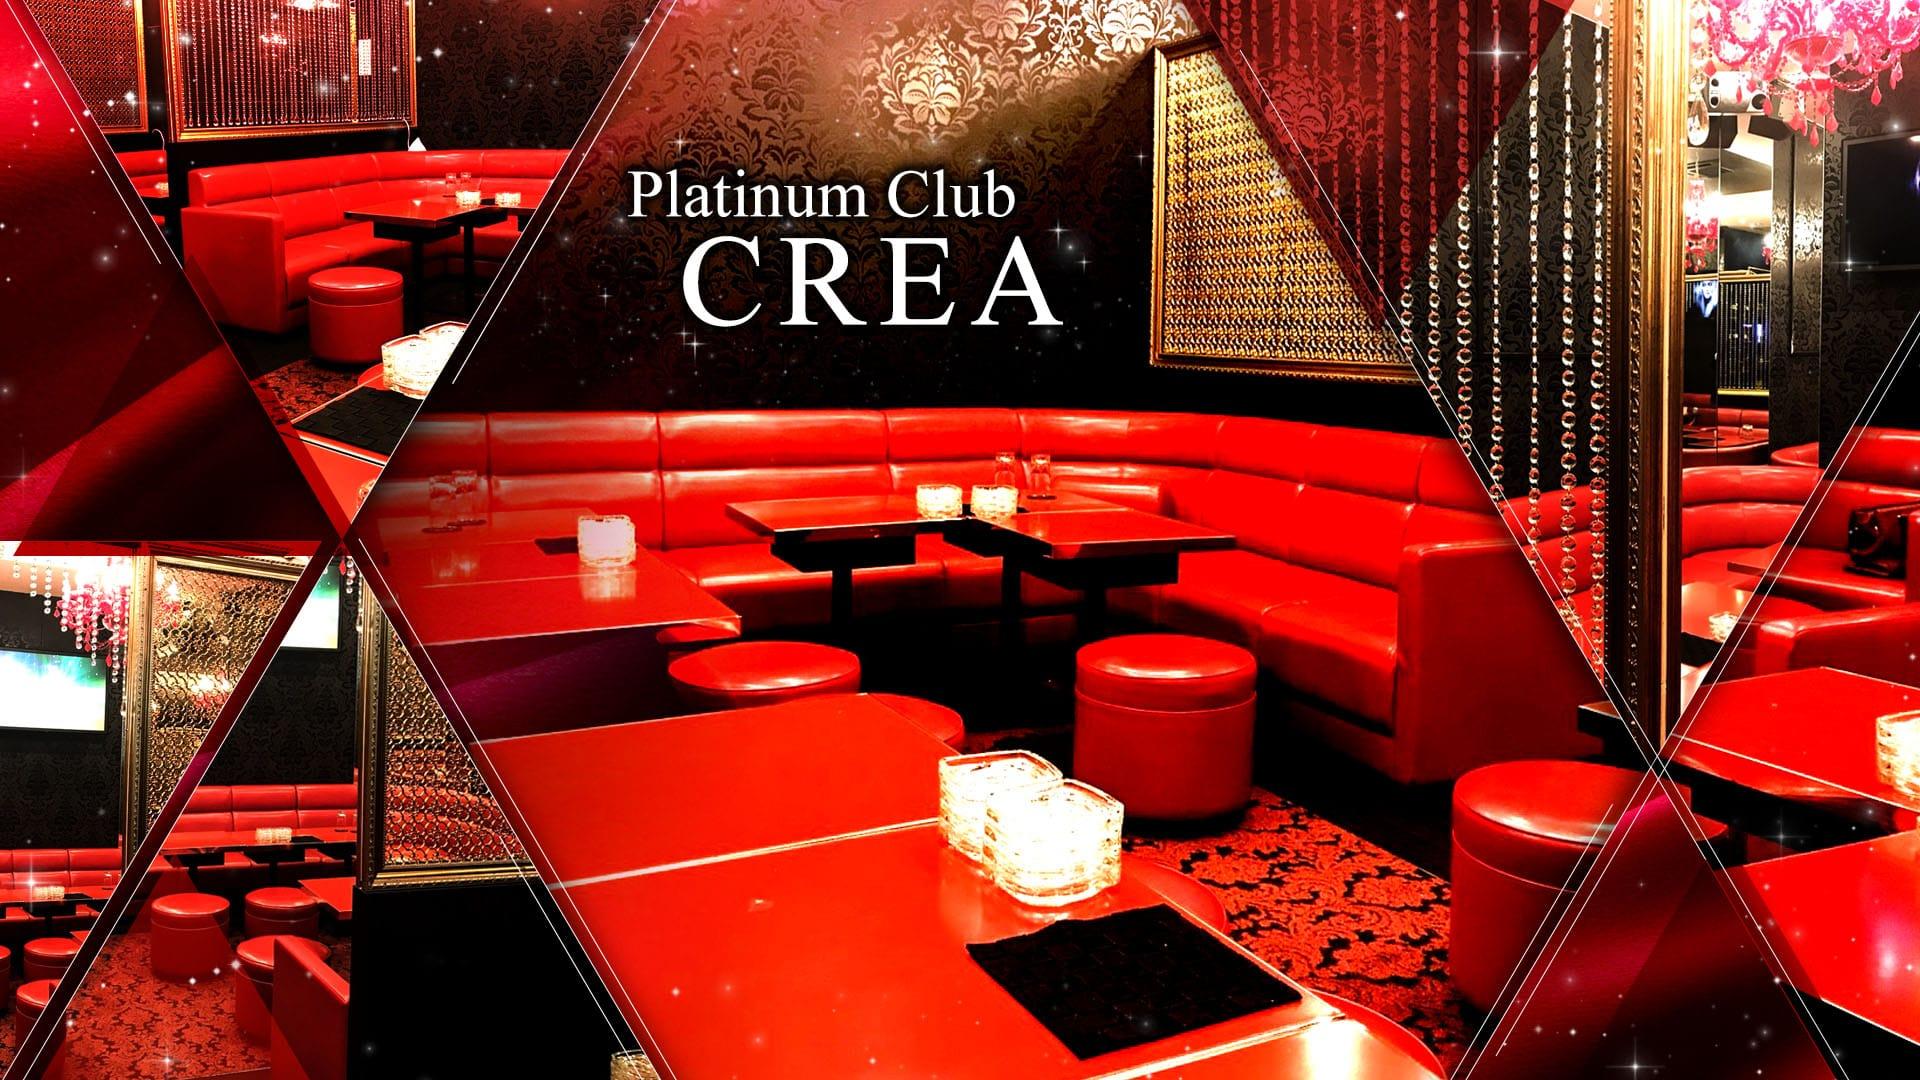 Platinum Club CREA(クレア) 上野姉キャバ・半熟キャバ TOP画像